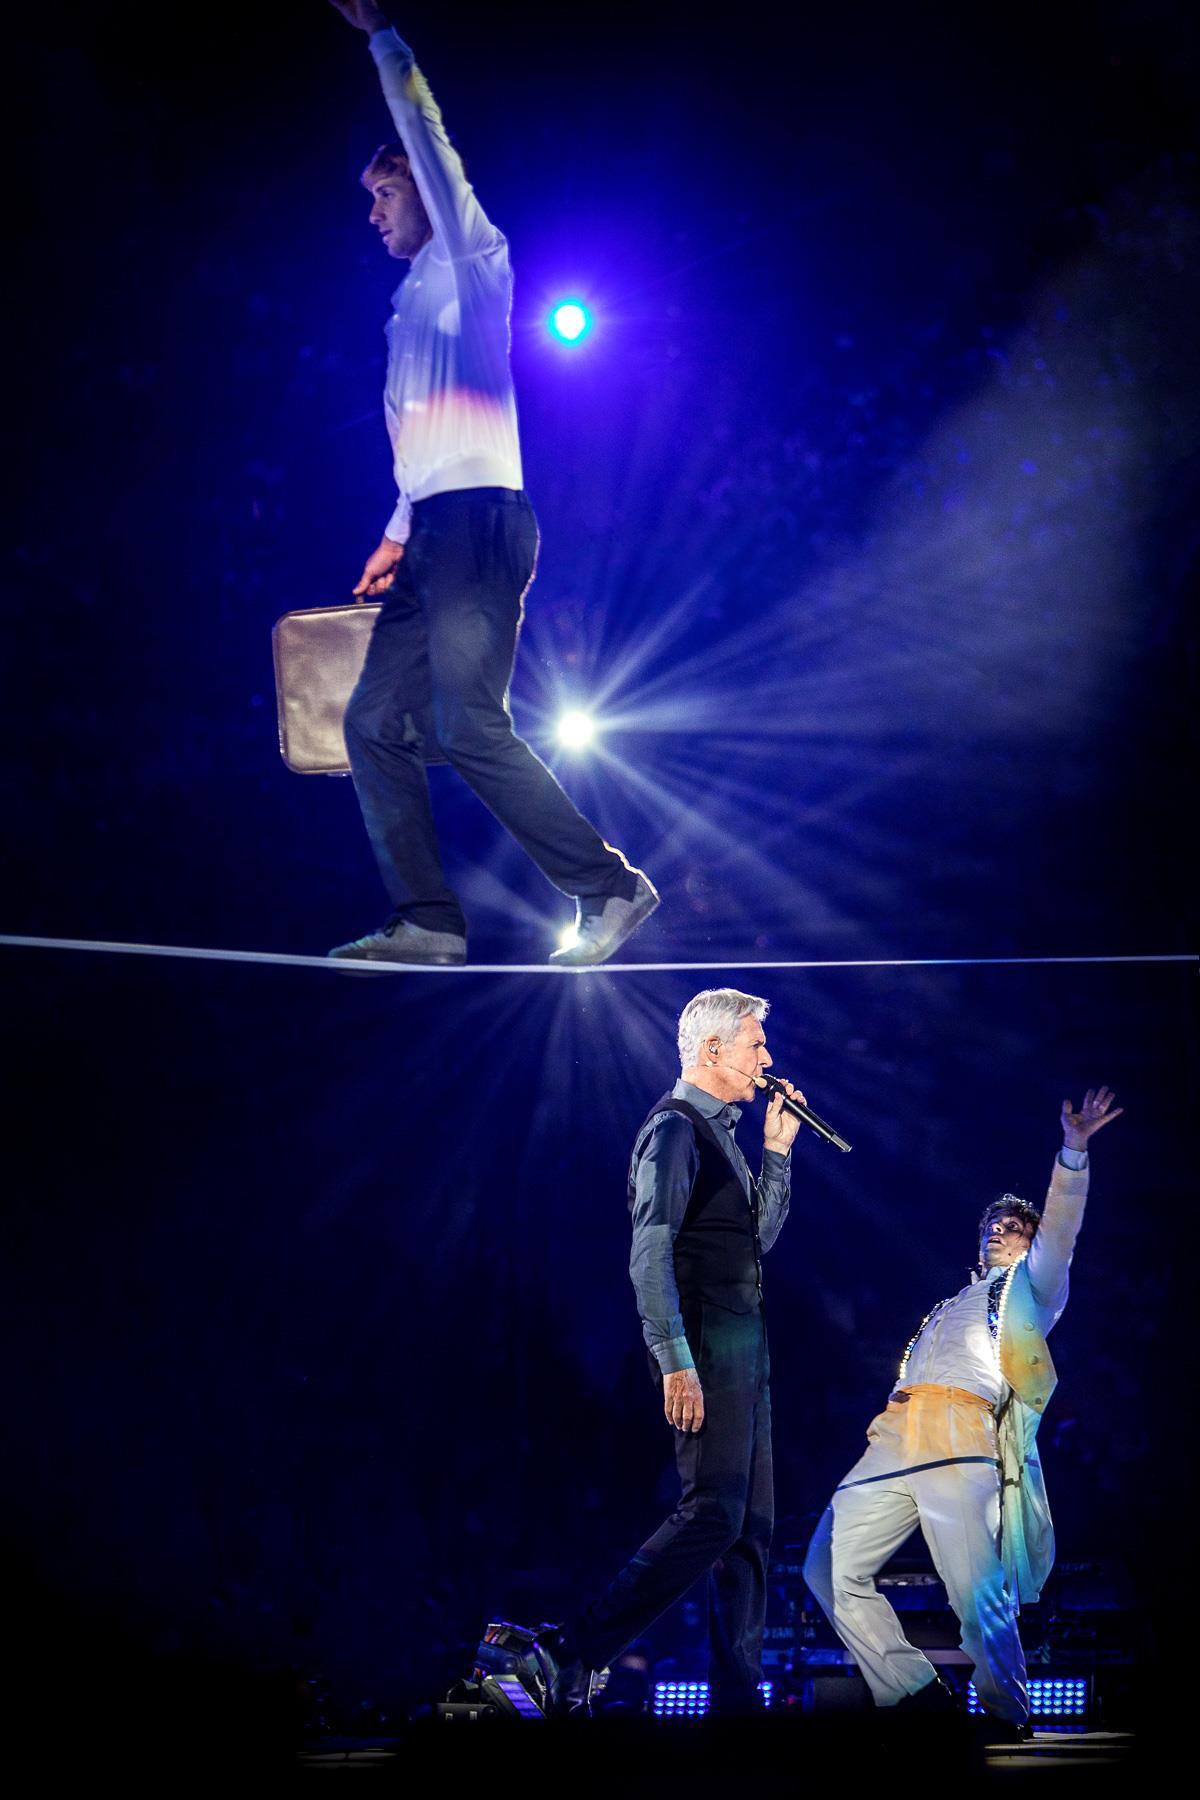 claudio baglioni arena di verona italia italy 50 al centro highline trickline show funambule circus performance spectacle suisse Slackline Lyell Grunberg  (7).jpg